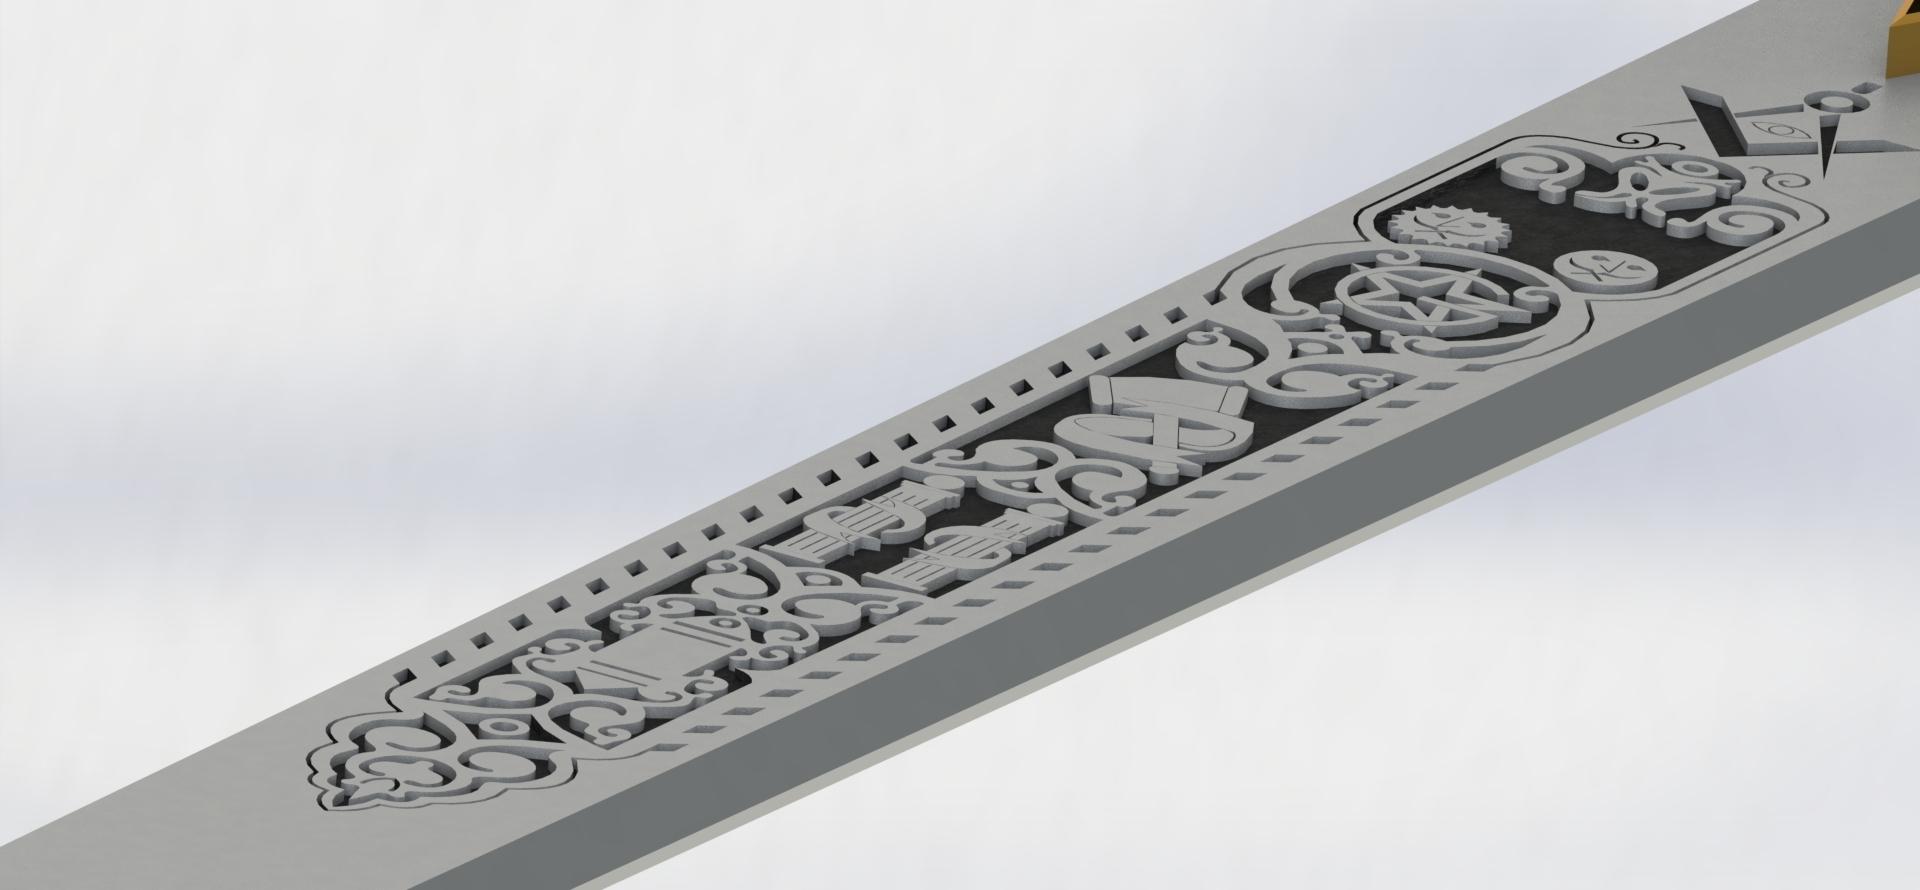 preview20.JPG Download STL file Masonic Ceremony Sword-Ready 3D Print • 3D printable template, GokBoru